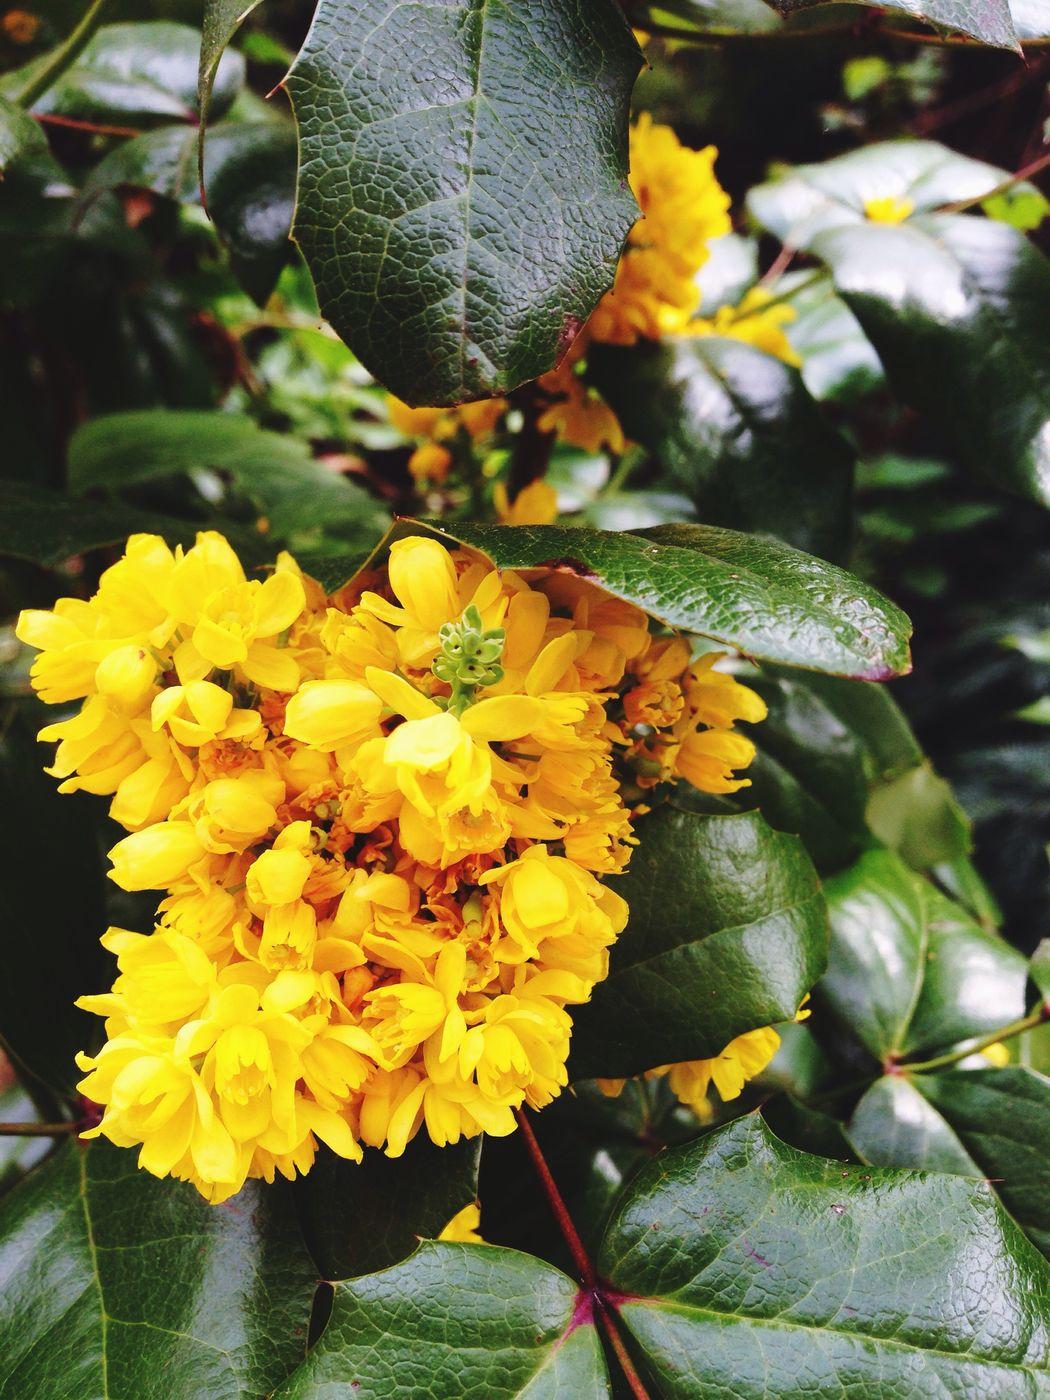 Freshness Green Yellow Feverish Tropical